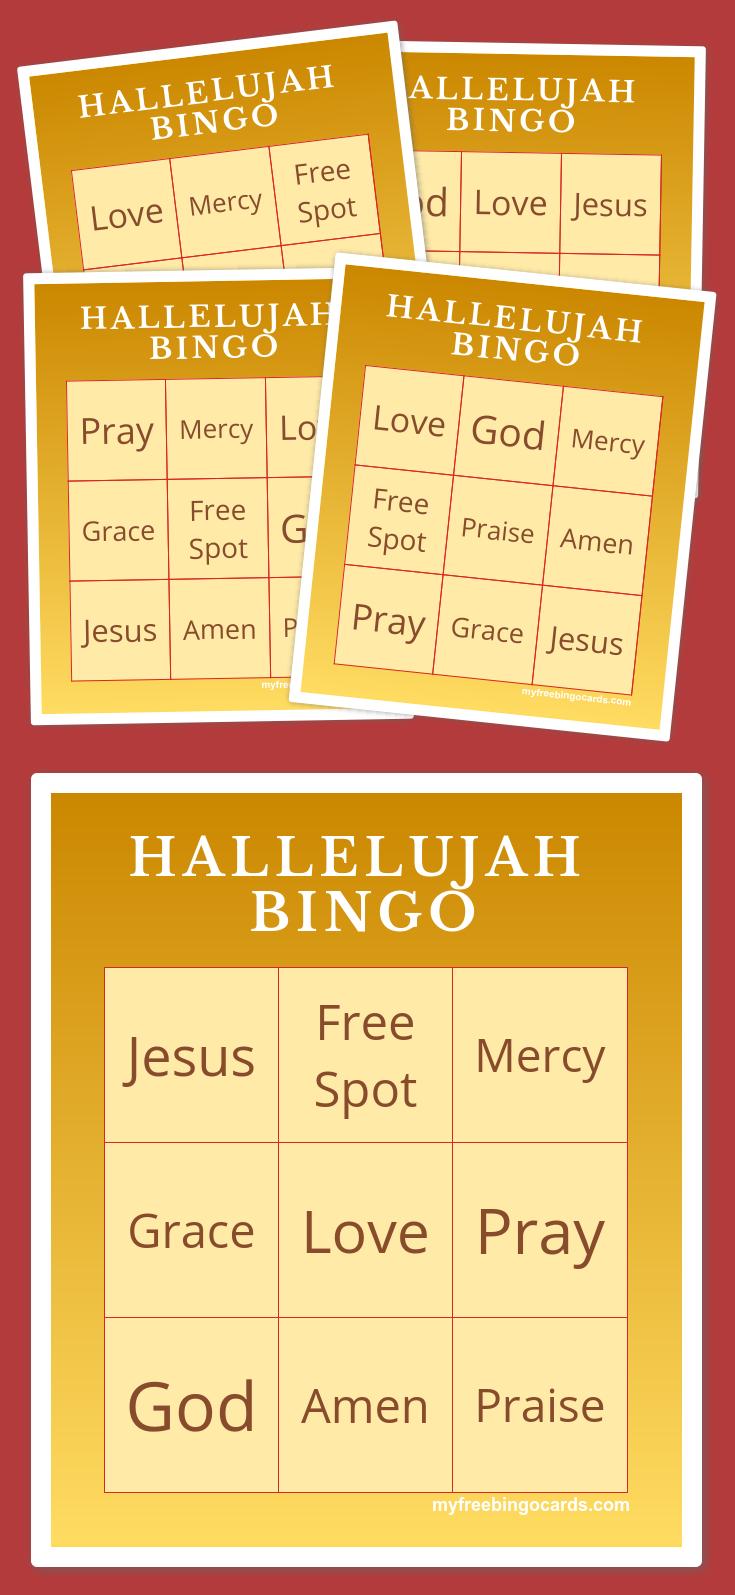 Hallelujah Bingo | Bingo Cards Printable, Free Printable